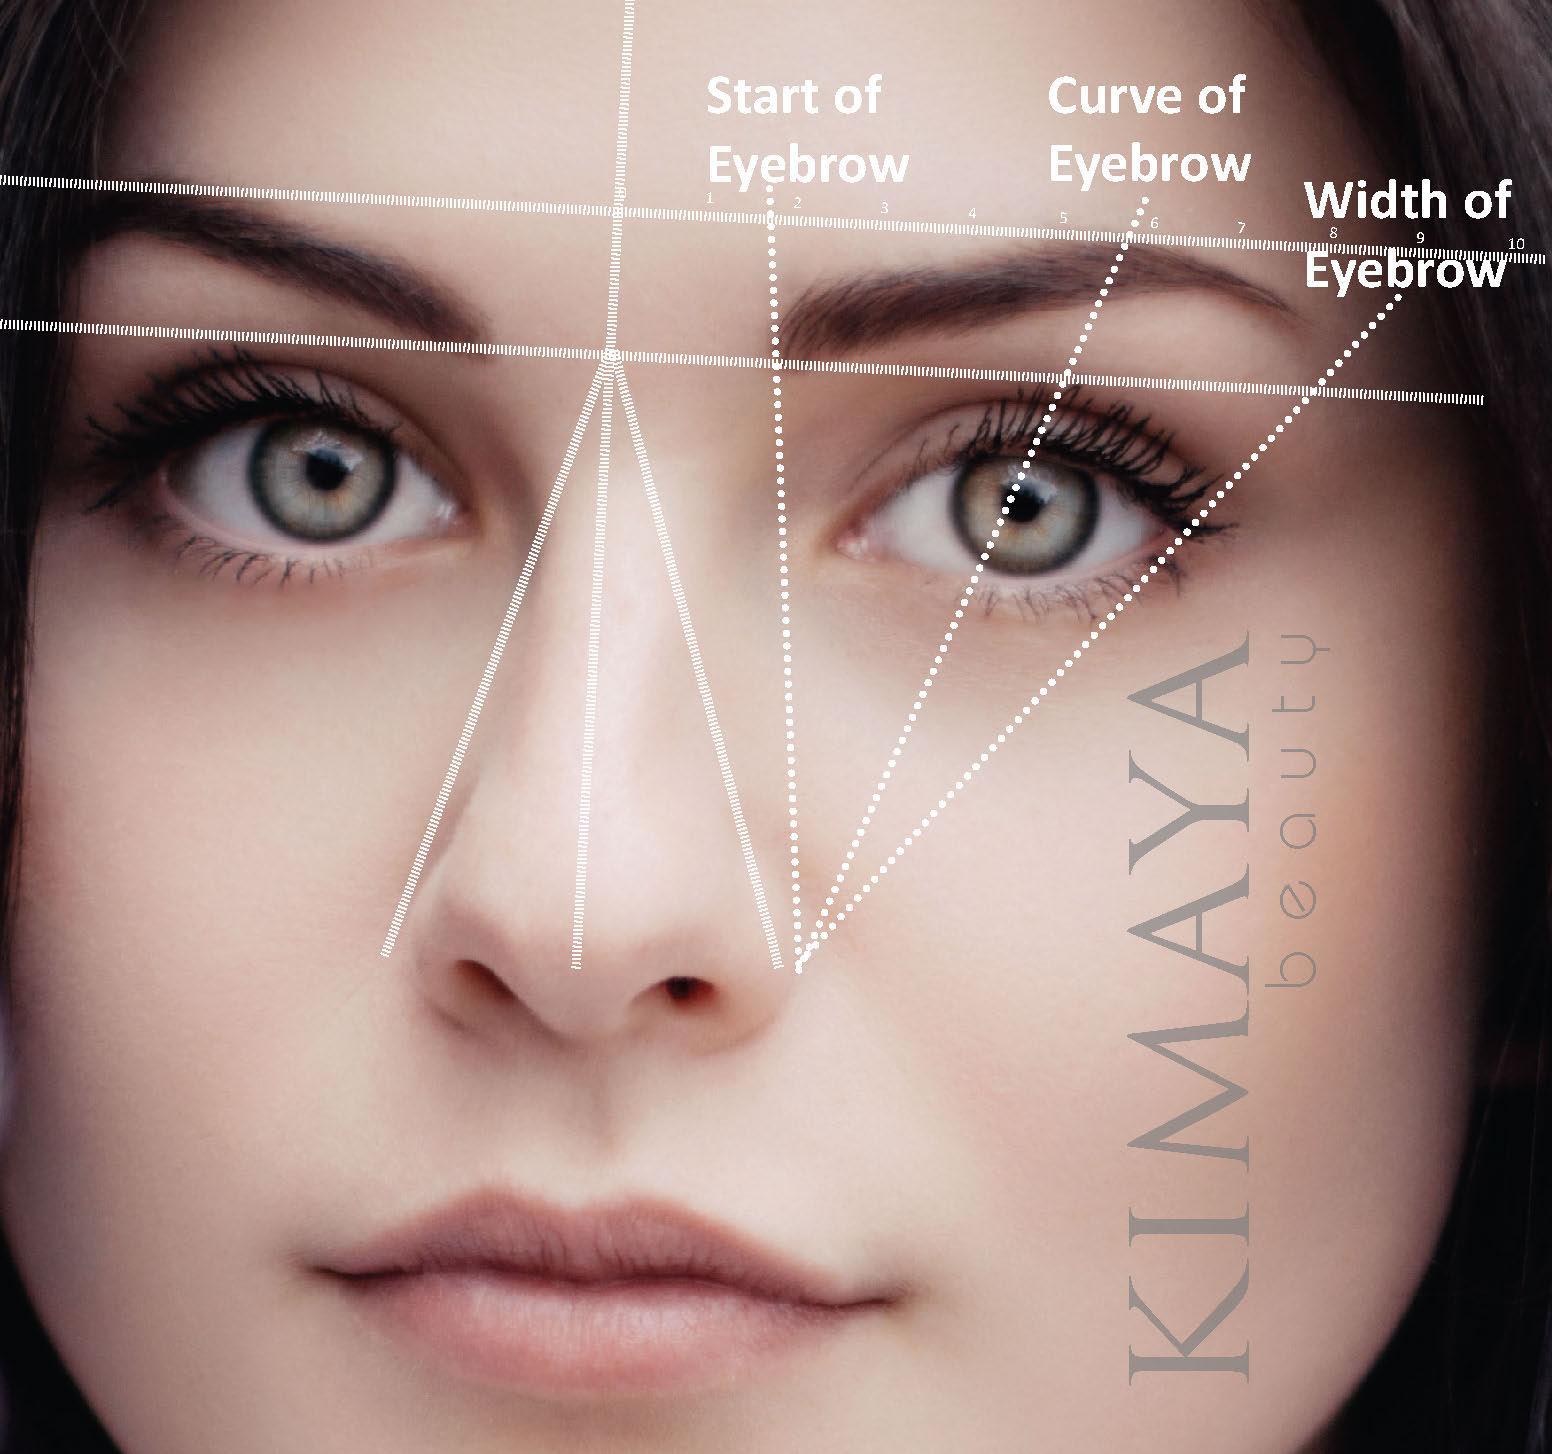 eyebrow science